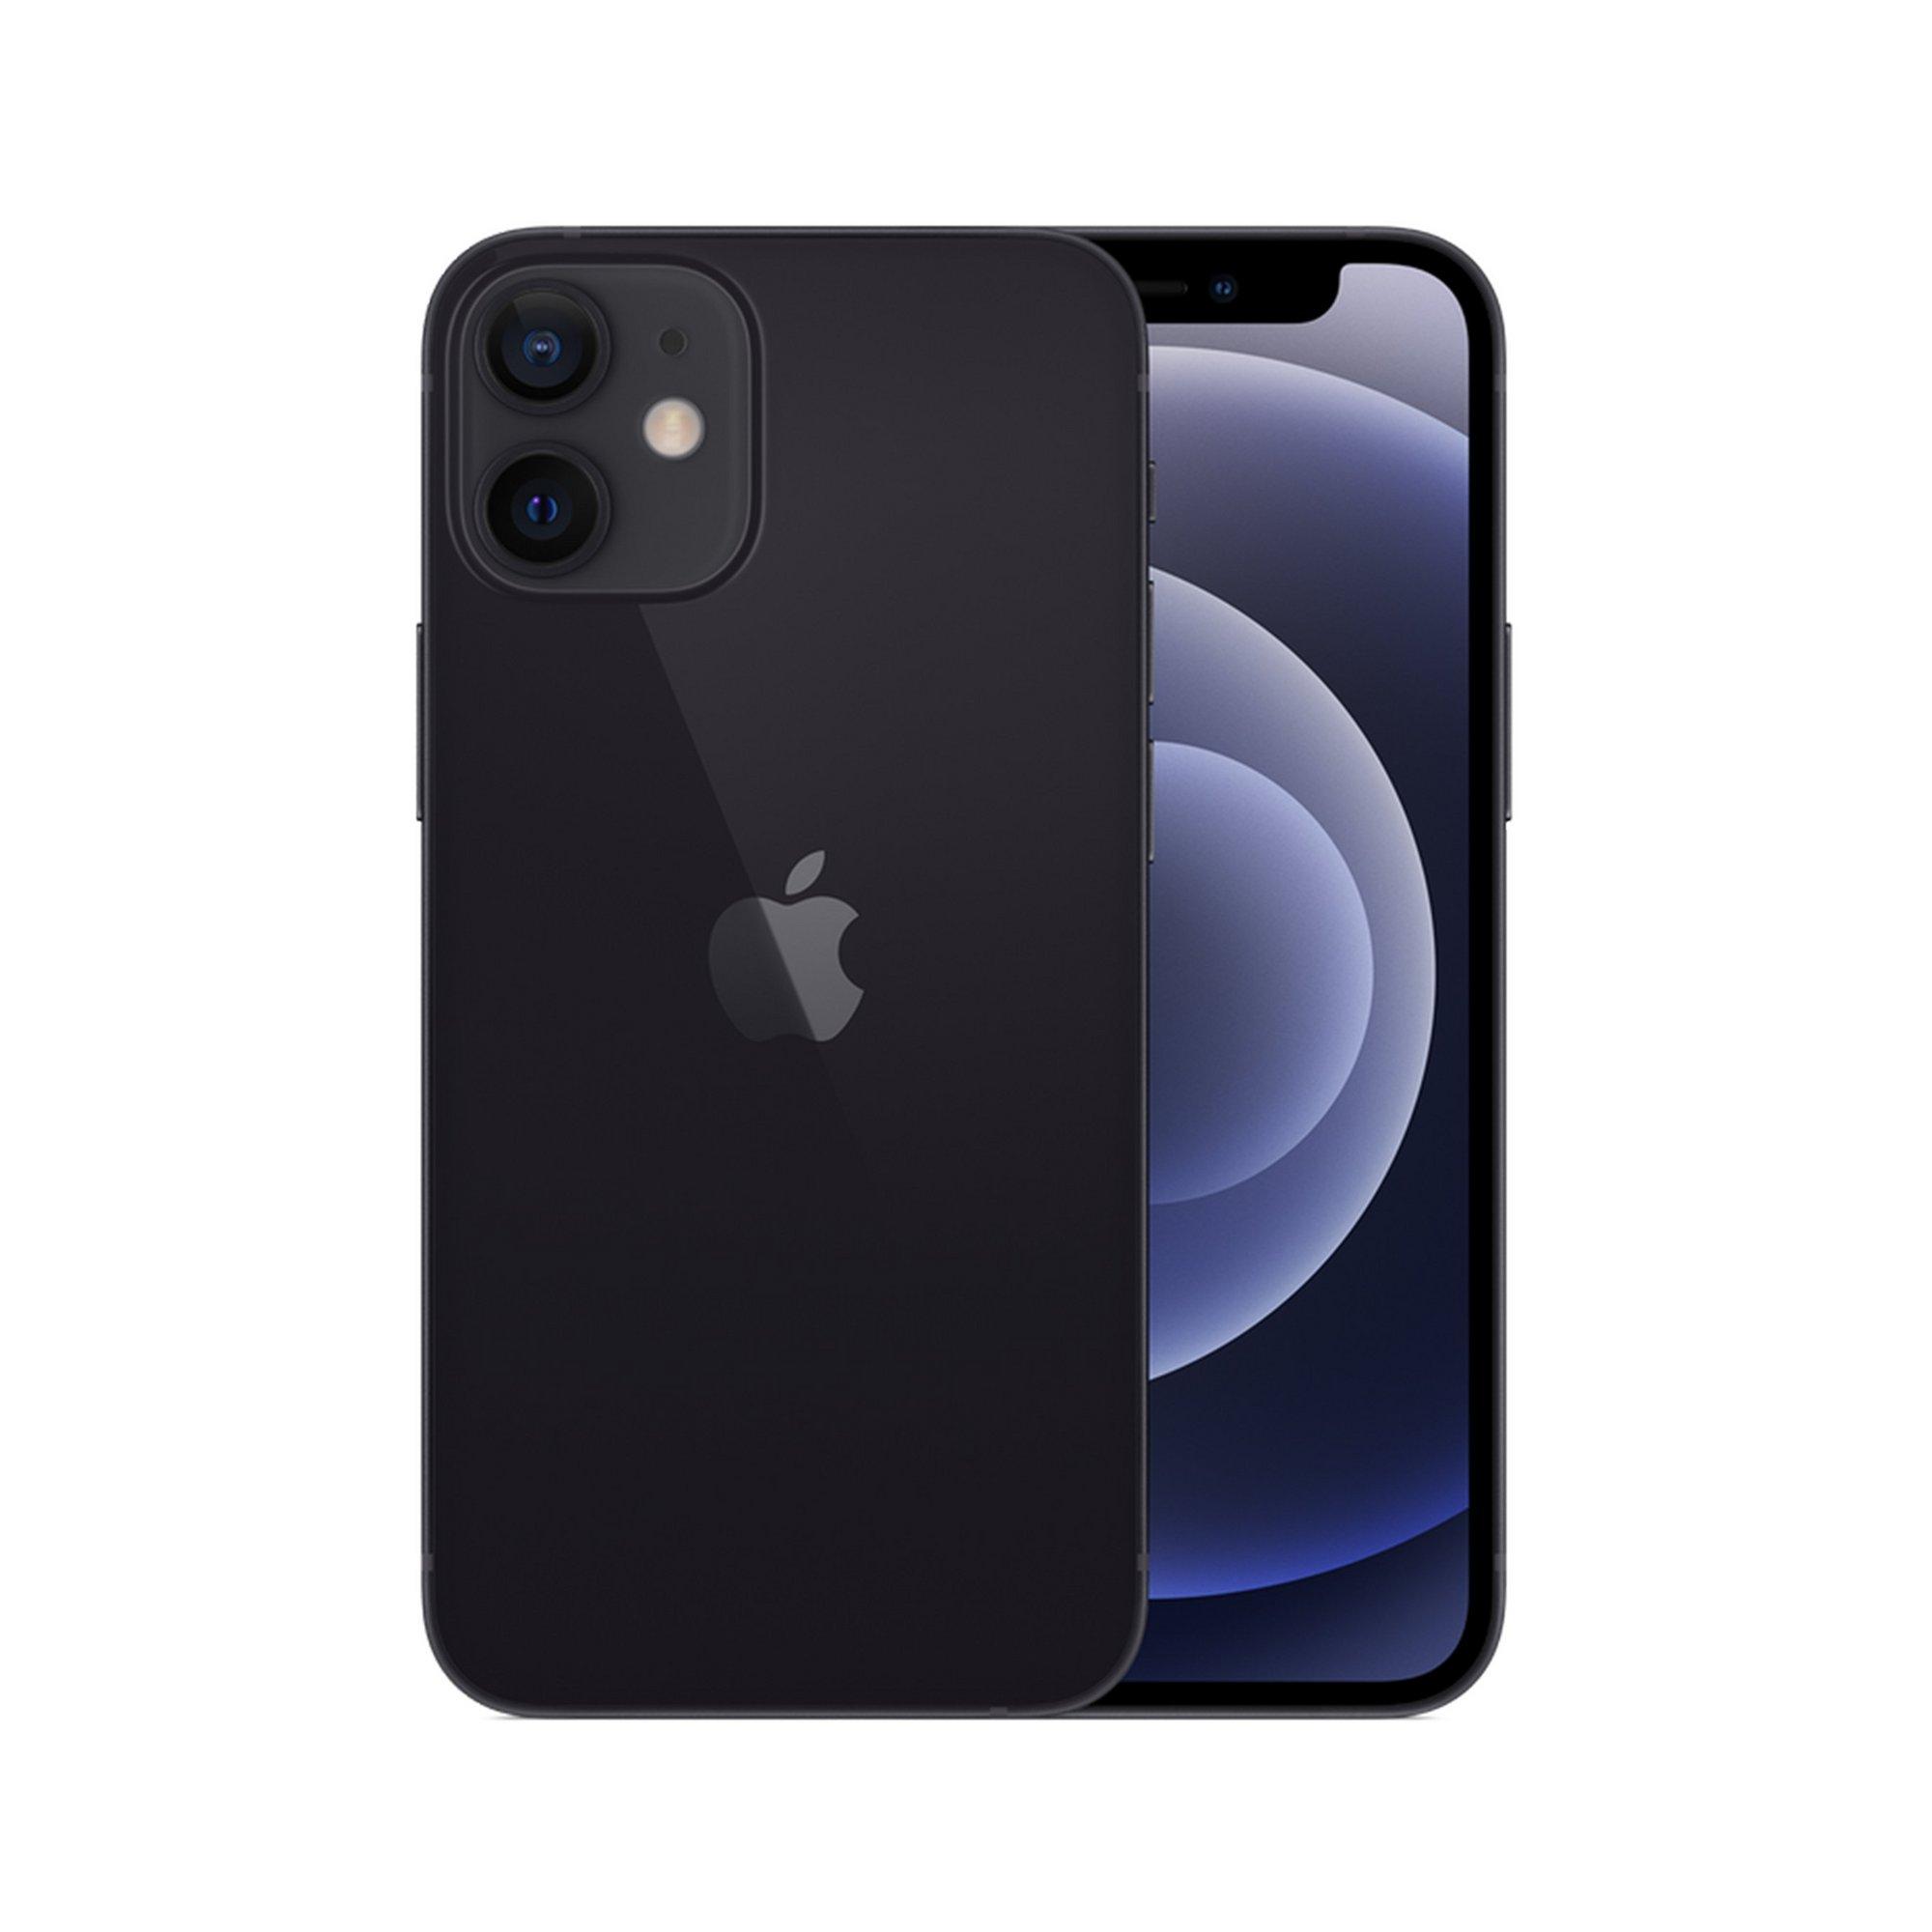 Image of iPhone 12 64GB